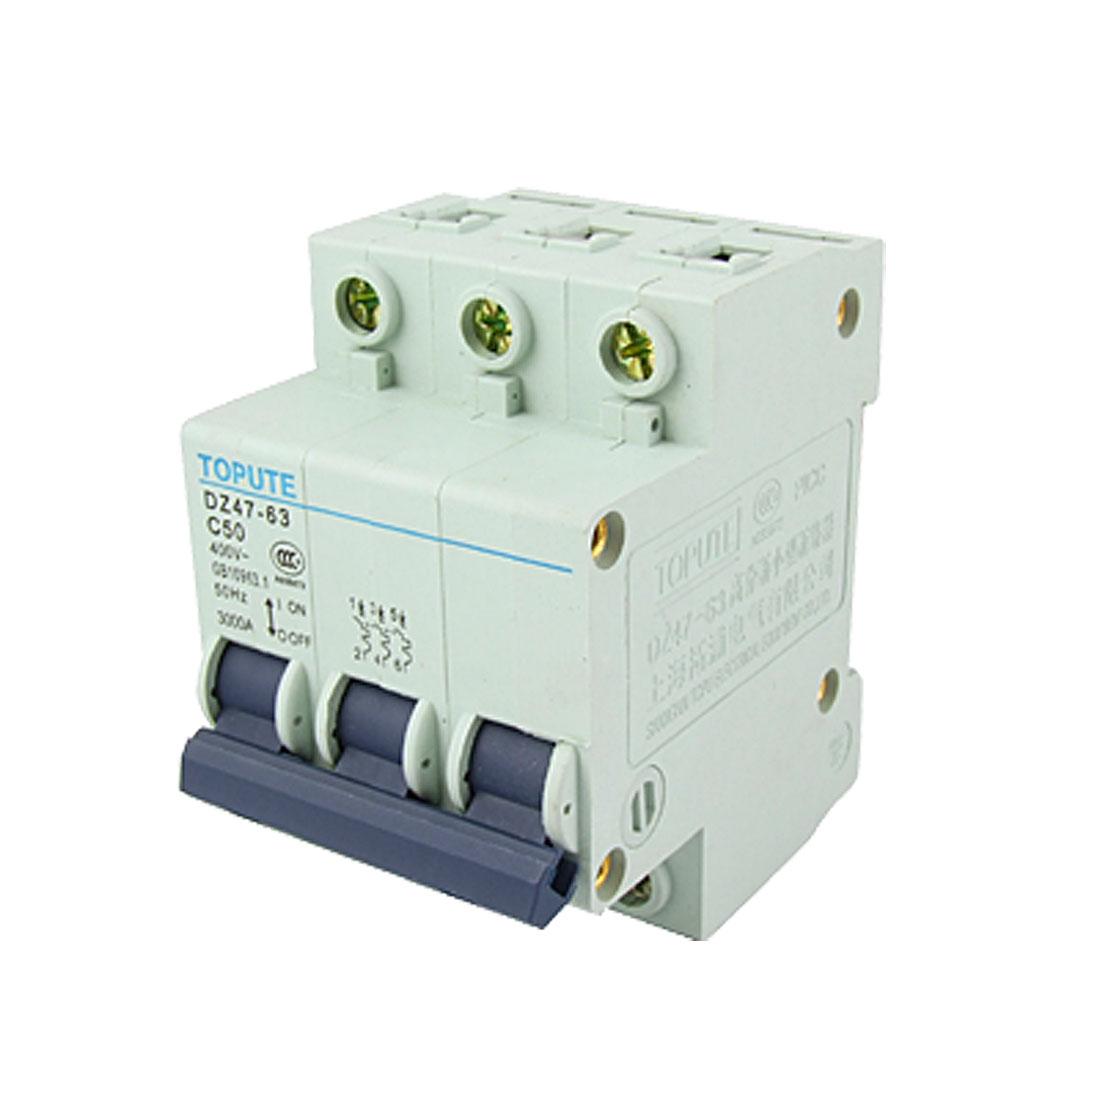 DZ47-63 C50 AC 400V 3P Miniature Circuit Breaker MCB